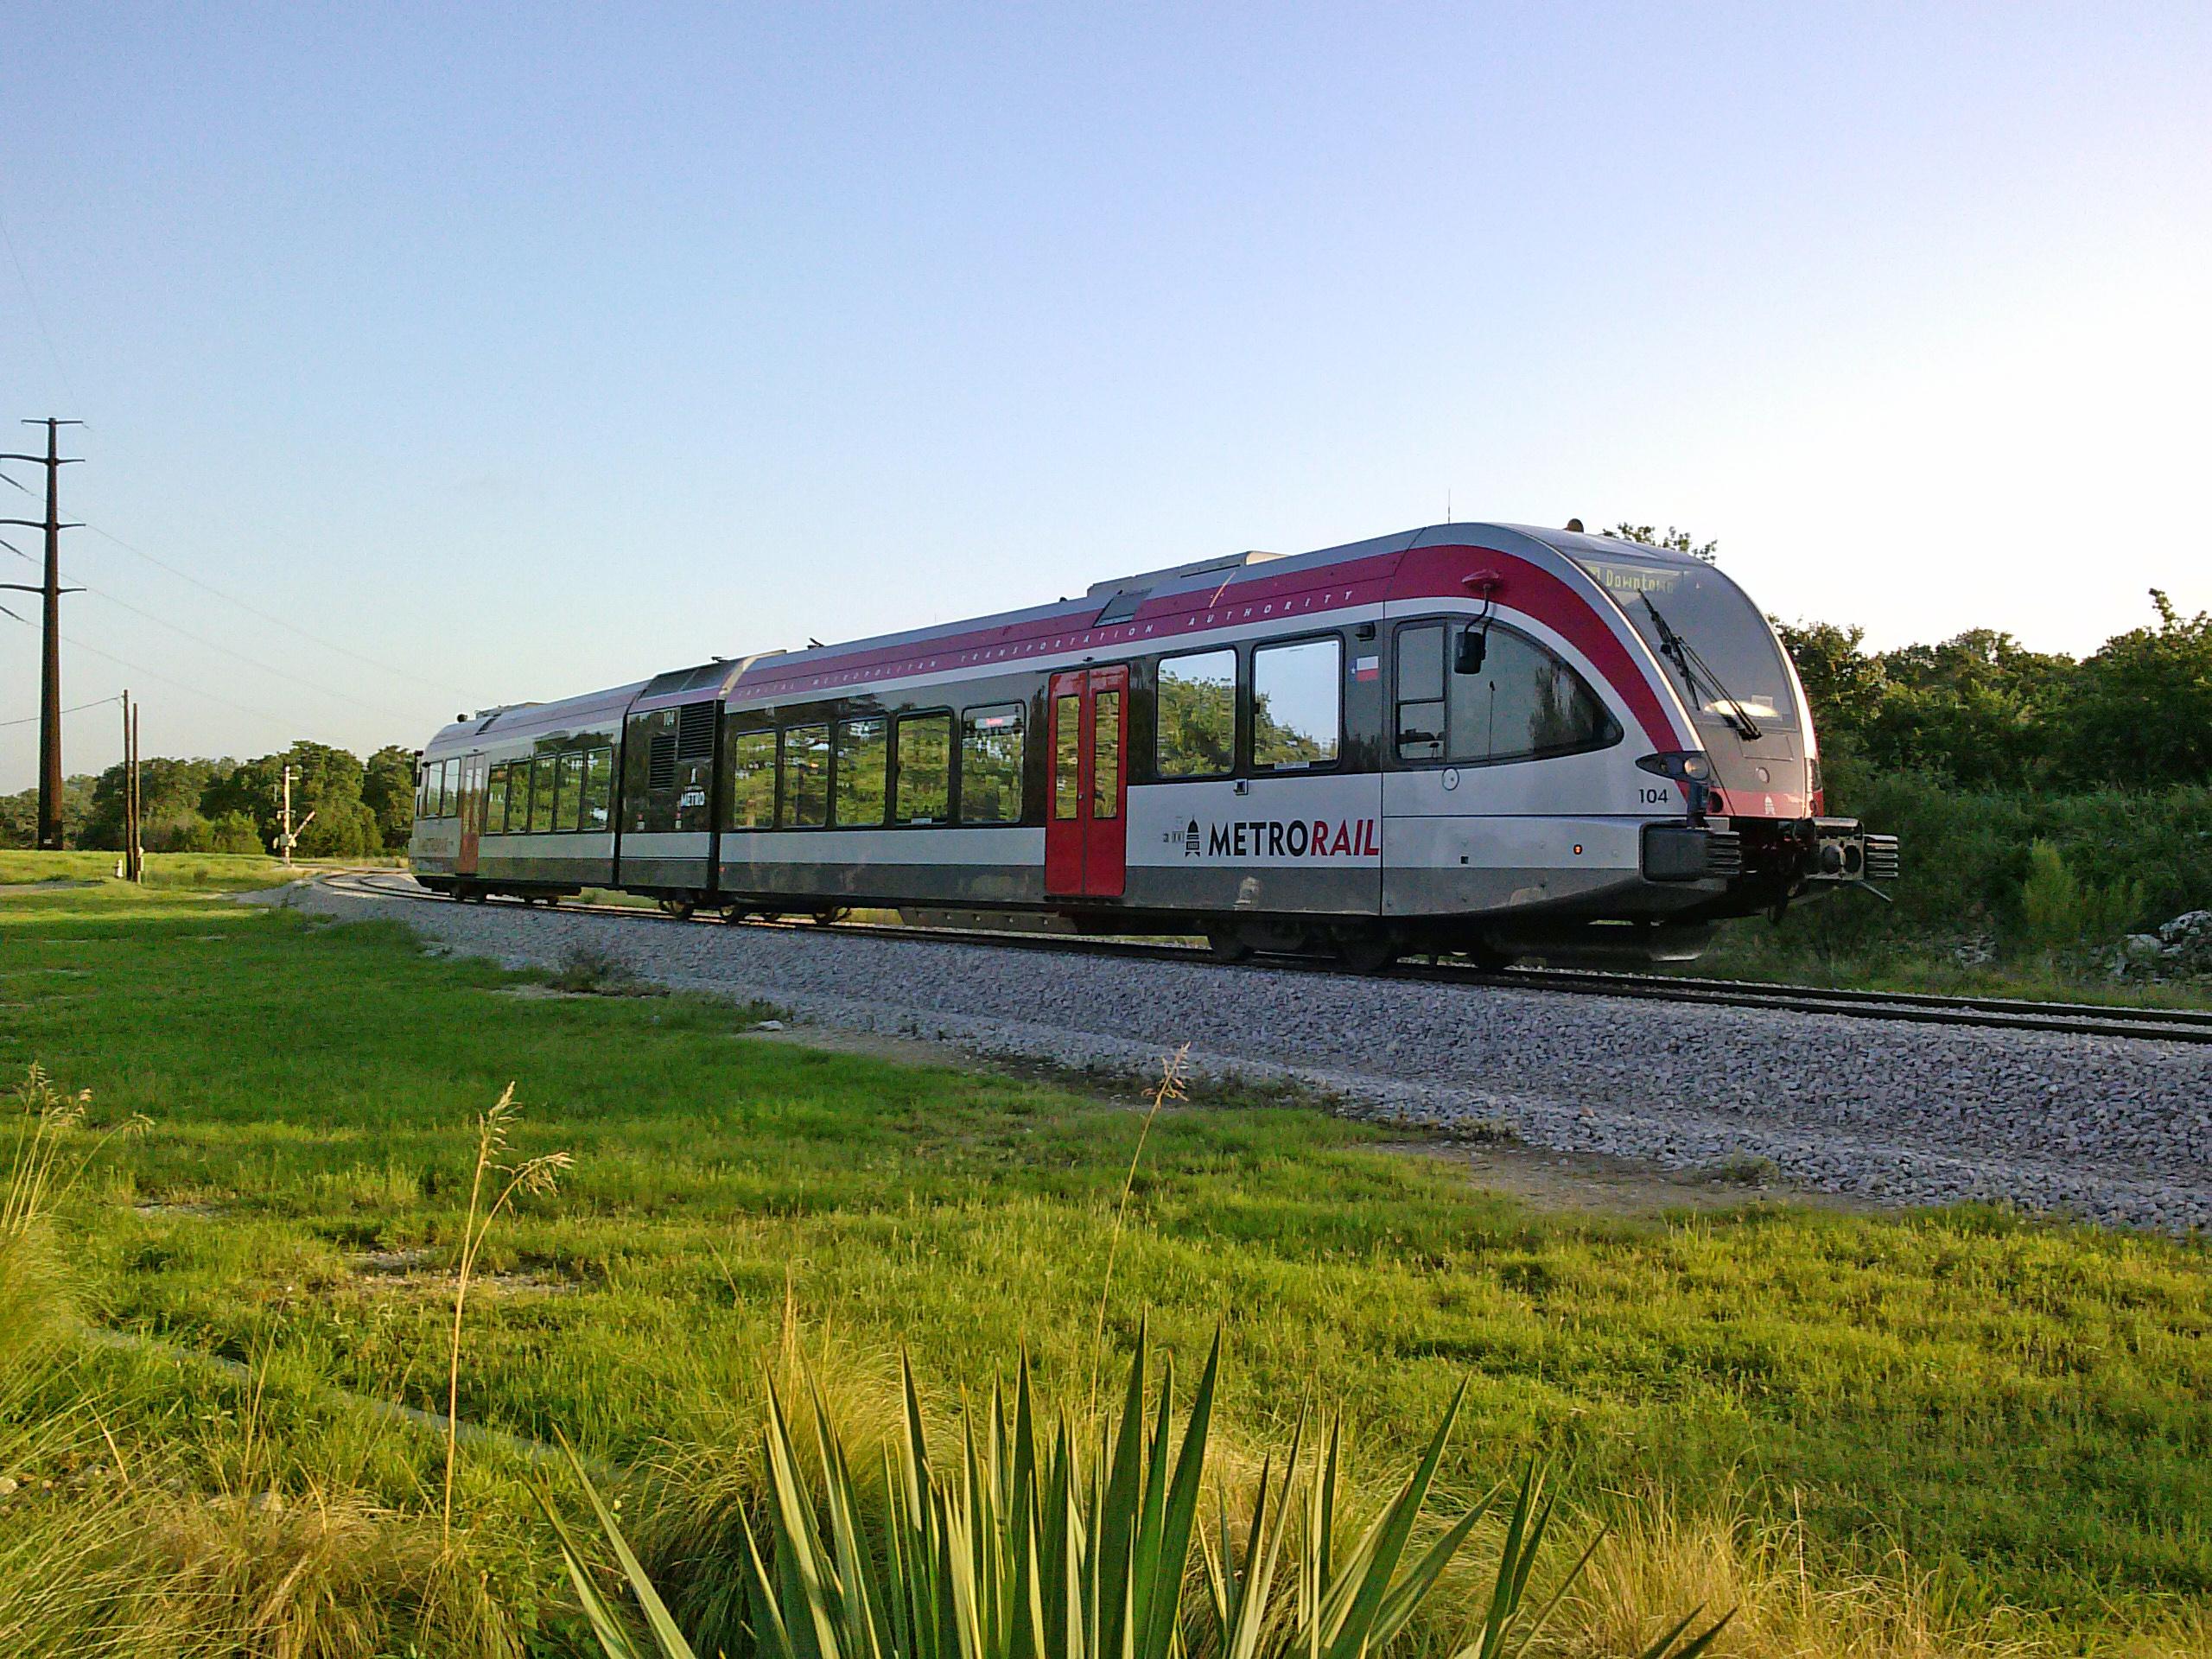 A Stadler GTW diesel-electric light rail vehicle on Austin's Red Line